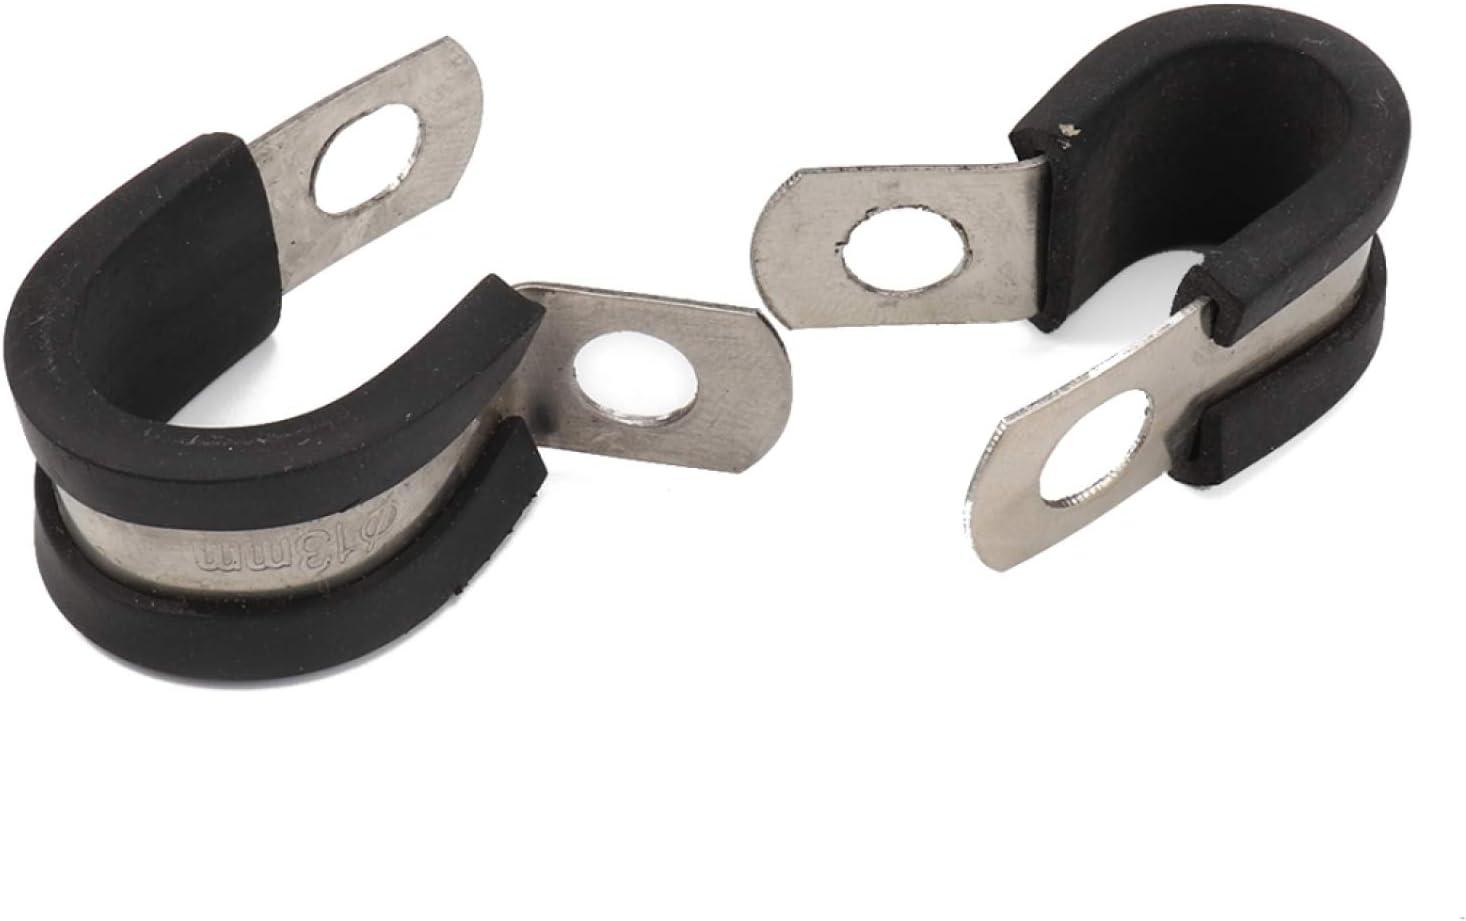 3//4 pulgadas, 10 p Abrazadera de cable de automoci/ón Amortiguador del coche de goma abrazaderas de pipa de acero inoxidable Abrazaderas y amortiguador de cable de goma Abrazaderas evitar la fricci/ón